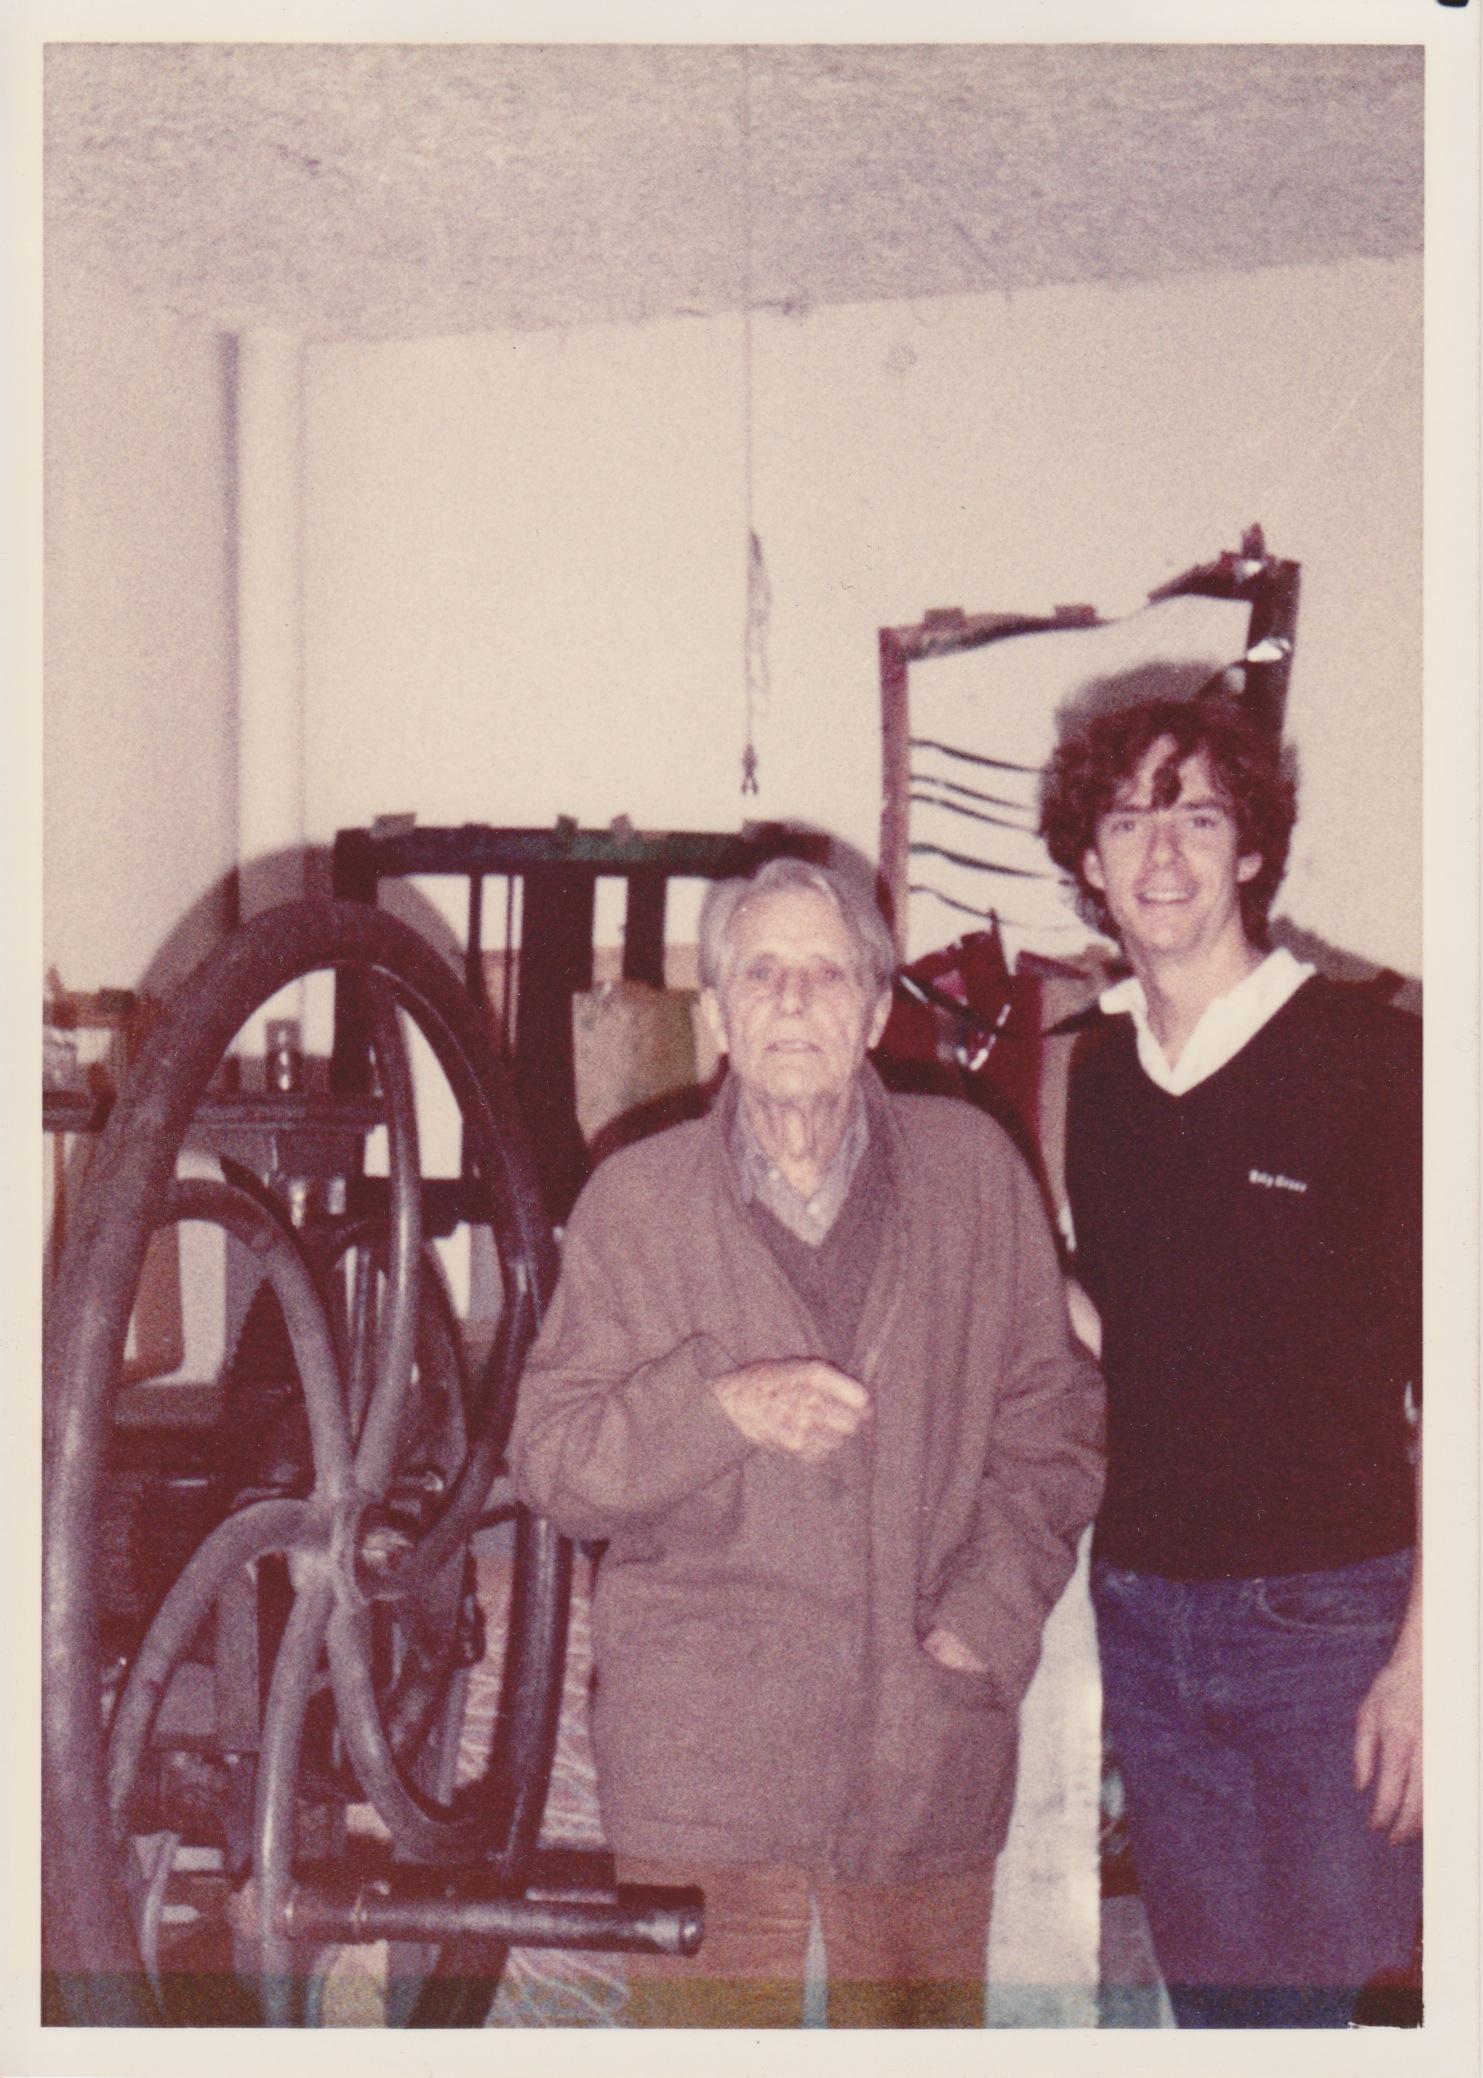 James Stroud and legendary printmaker Stanley William Hayter at Atelier 17, Paris 1980.